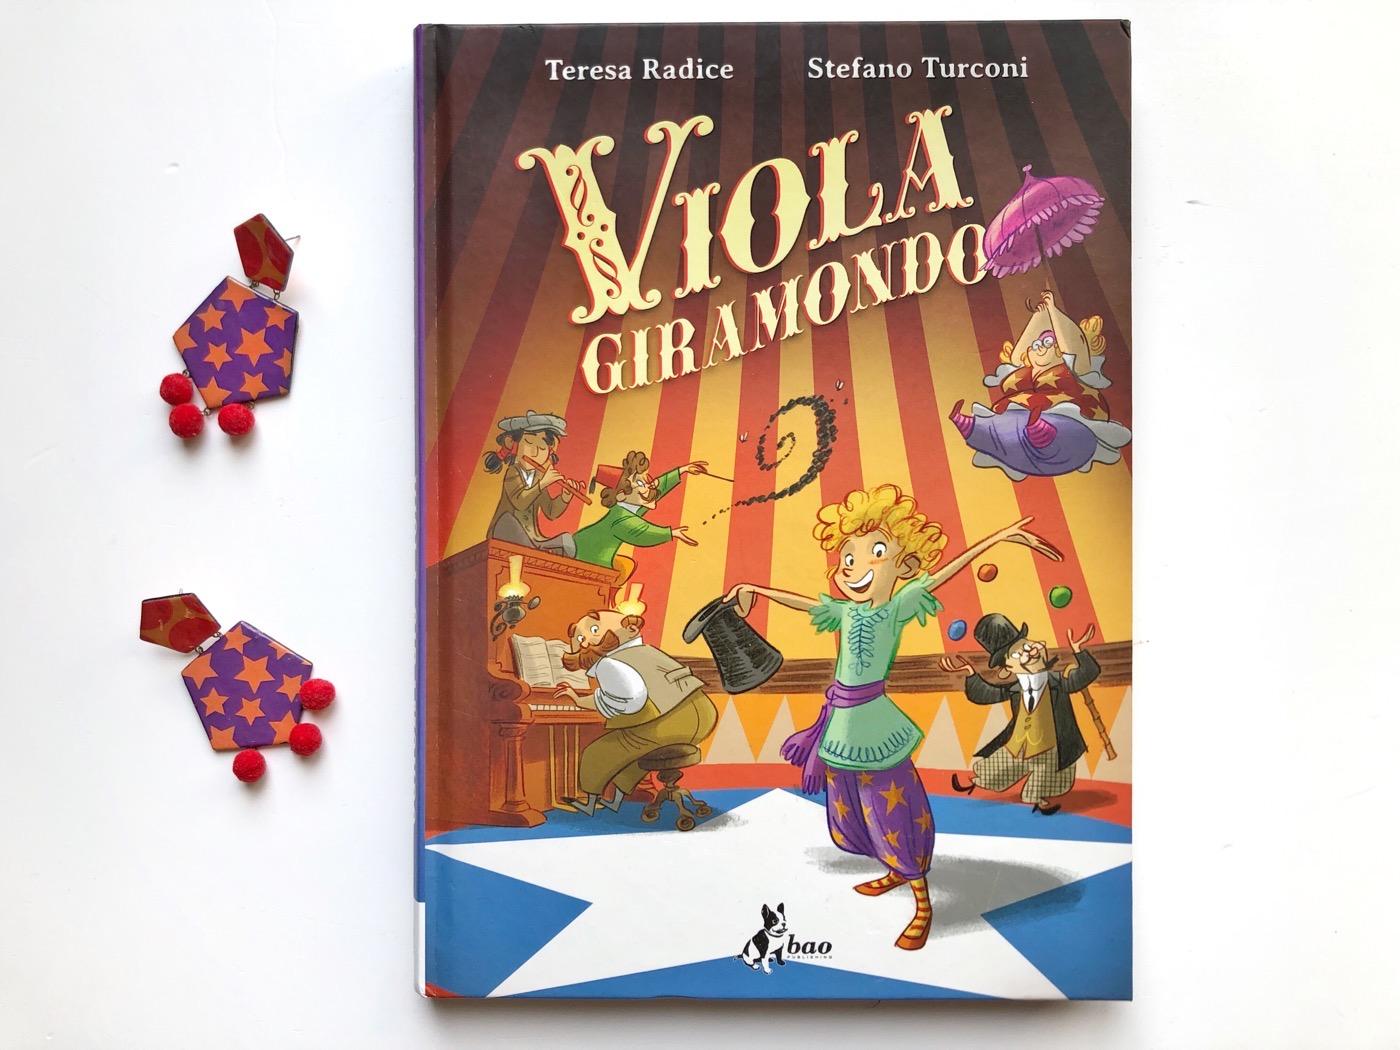 Viola-Giramondo-teresa-radice-stefano-turconi-bao-publishing